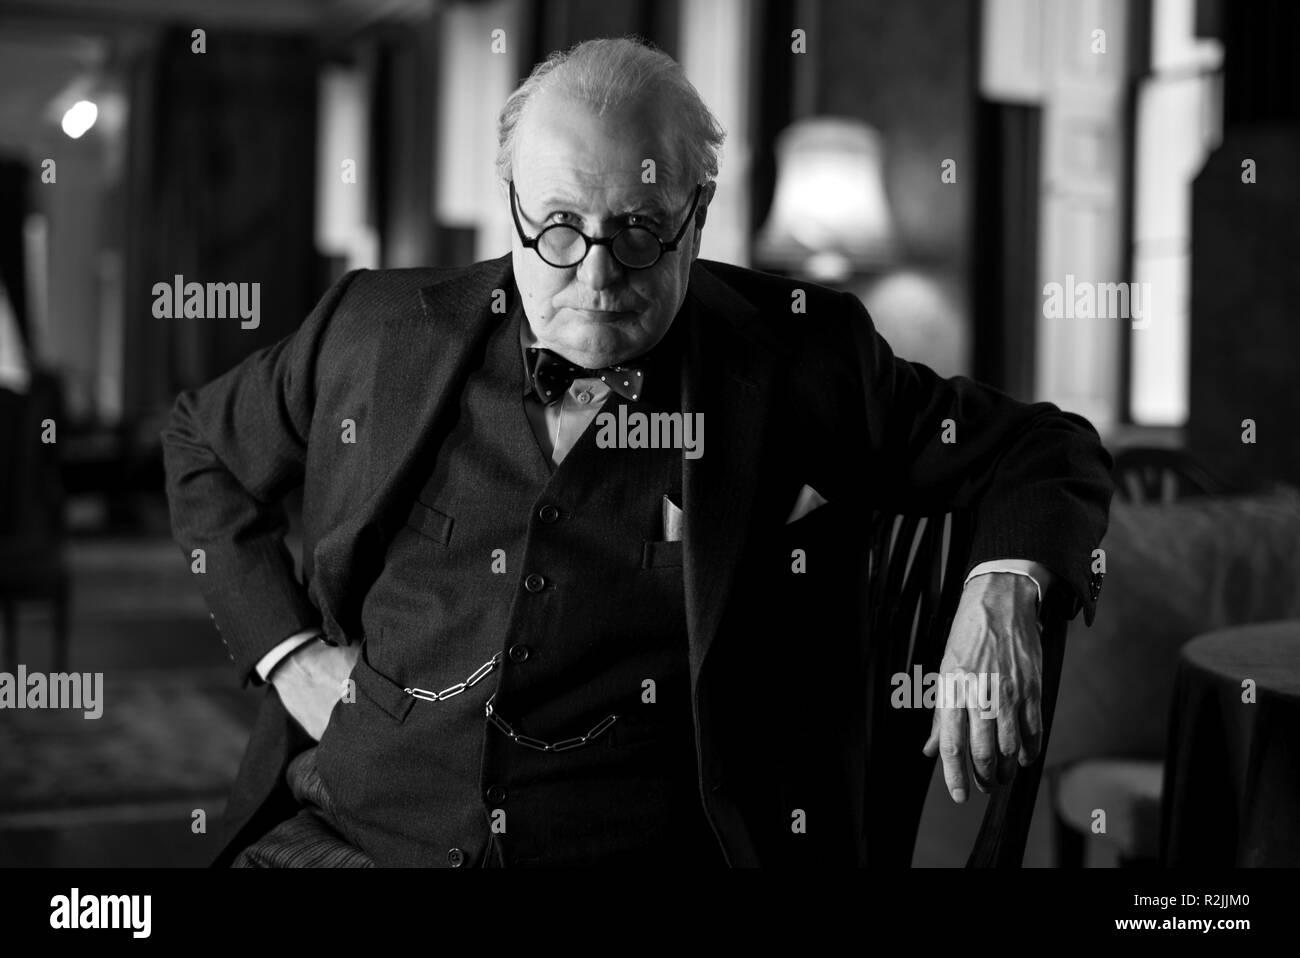 Darkest hour year 2017 uk director joe wright gary oldman stock image